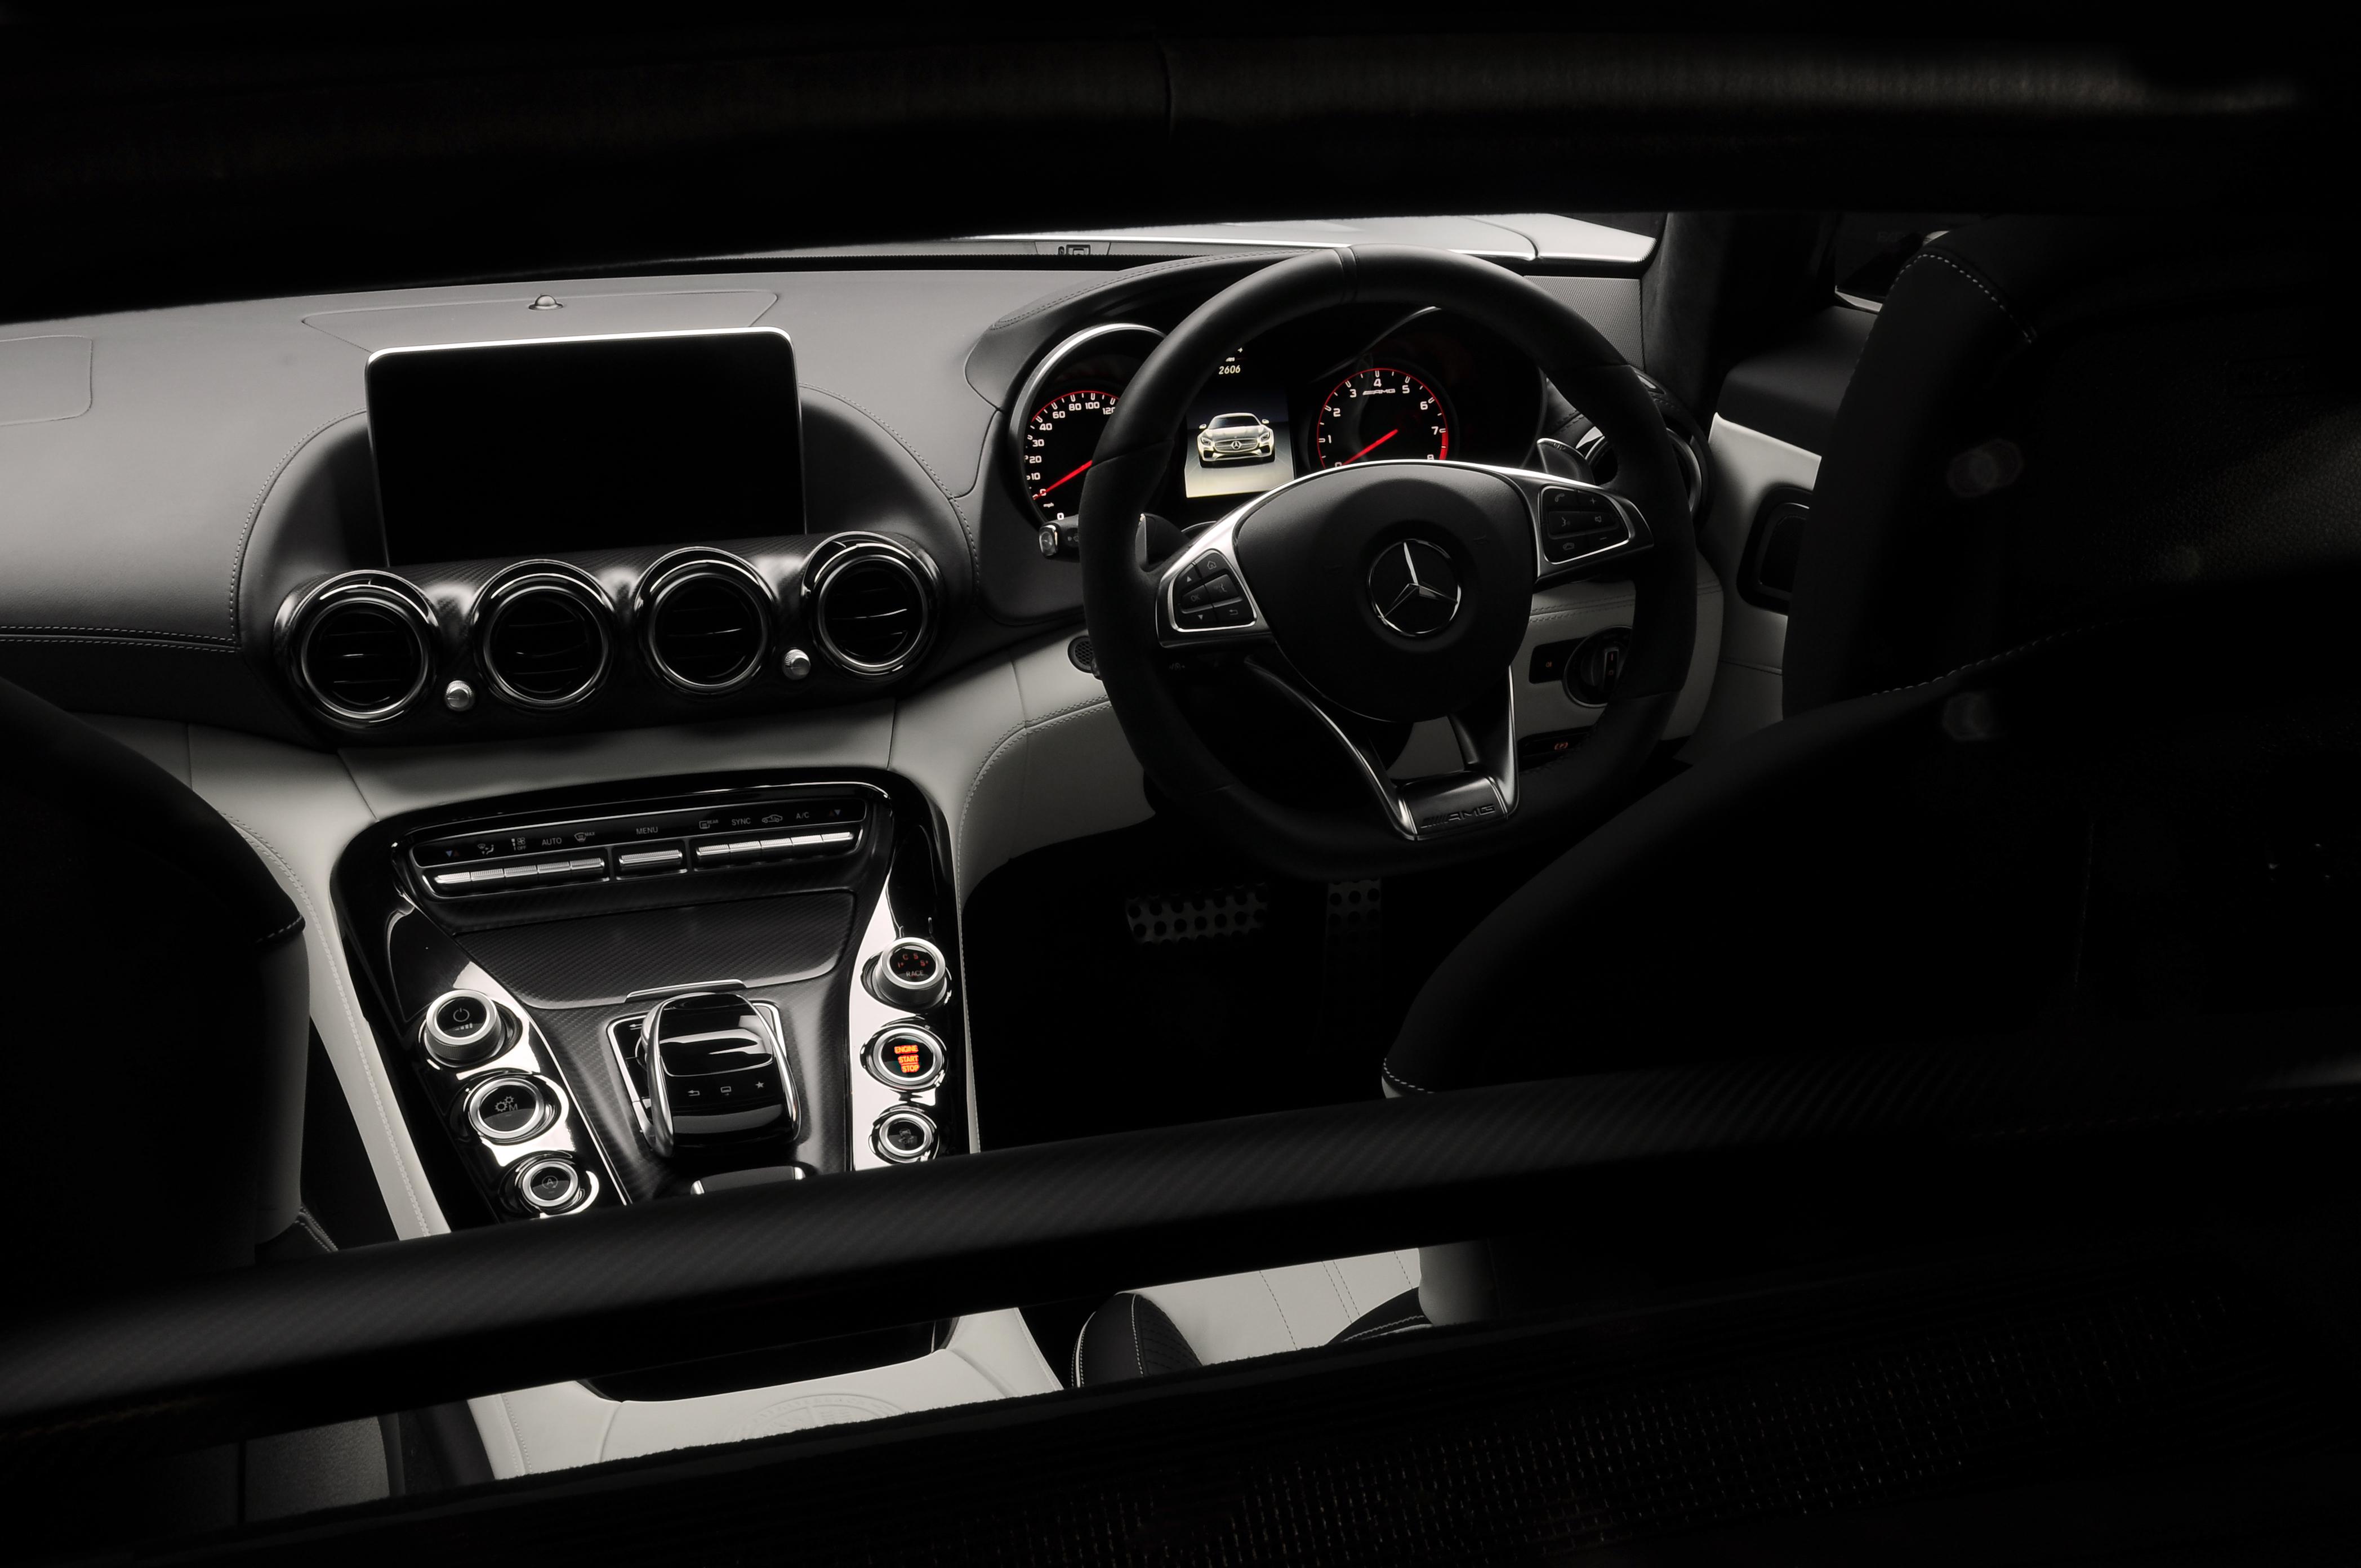 Mercedes AMG GT - Stealth